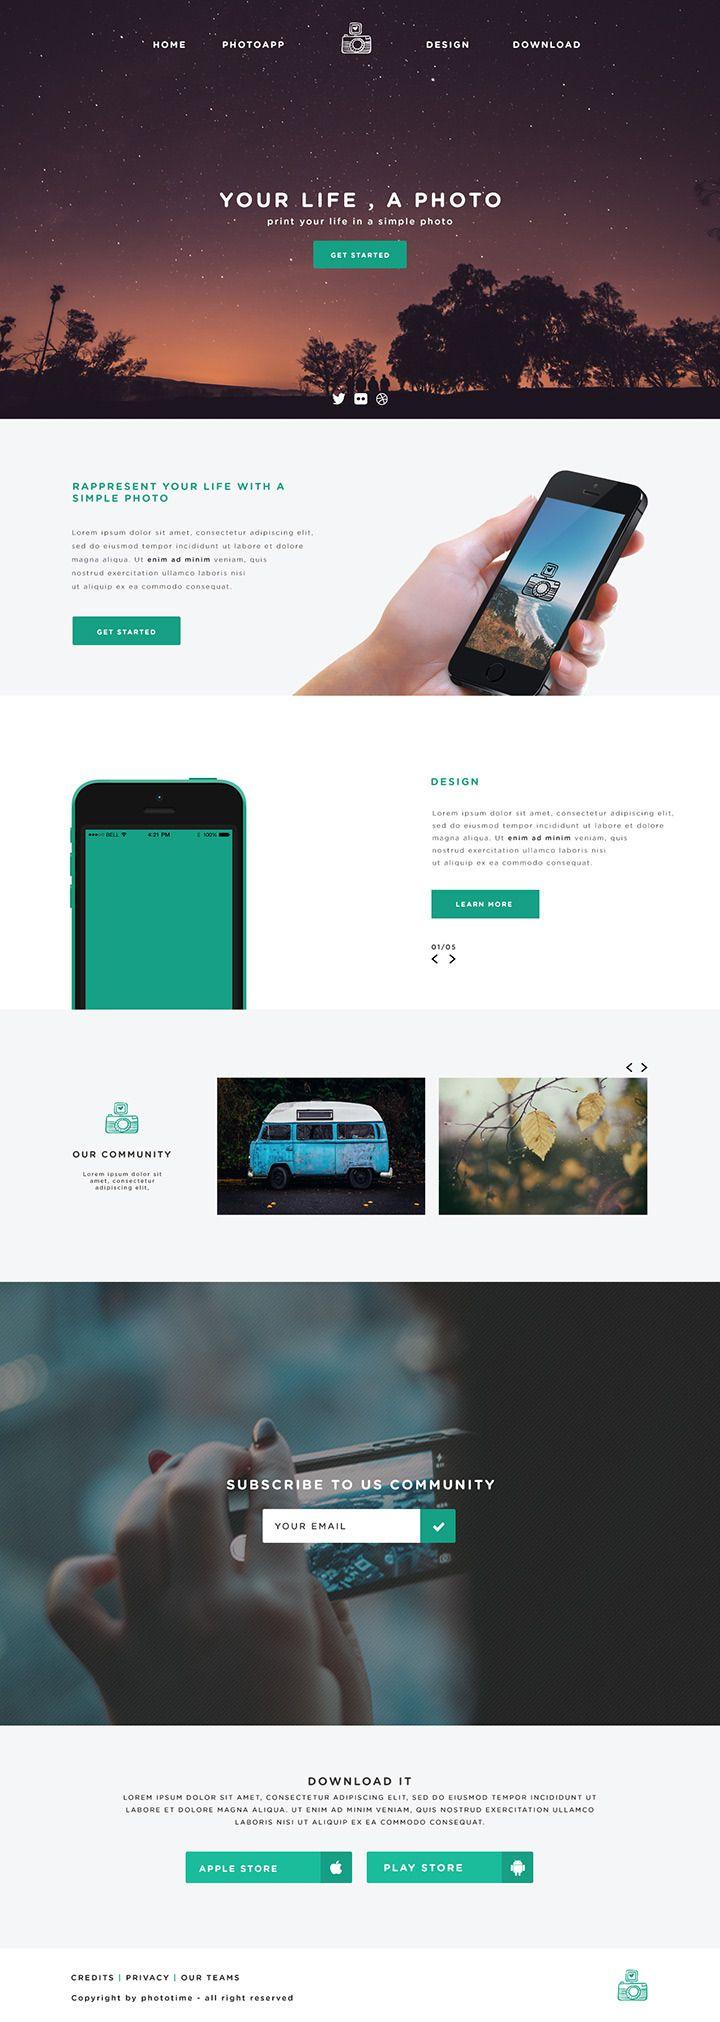 Phototime Free Website Template | Diseño web | Pinterest ...